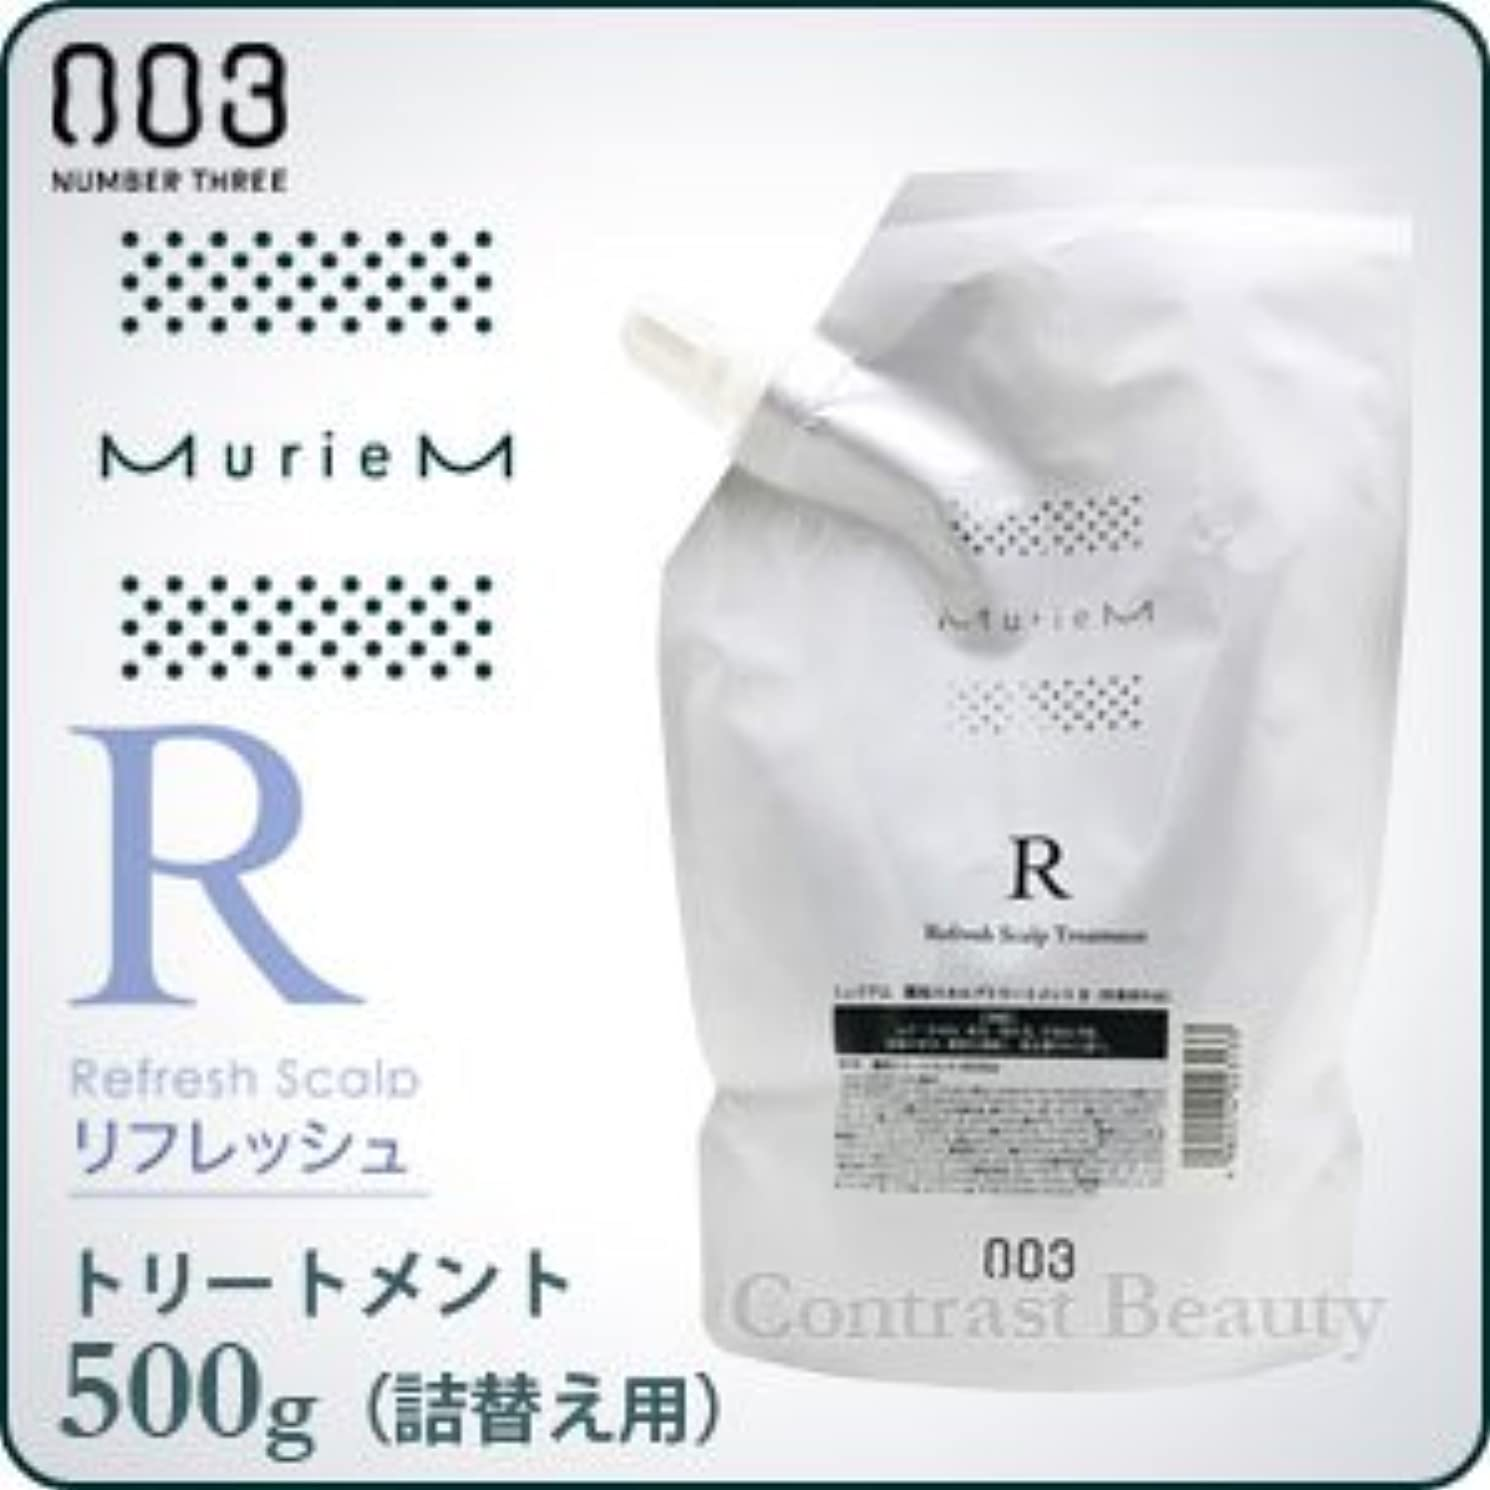 【X2個セット】 ナンバースリー ミュリアム クリスタル 薬用スカルプトリートメント R 500g 詰替え用 医薬部外品